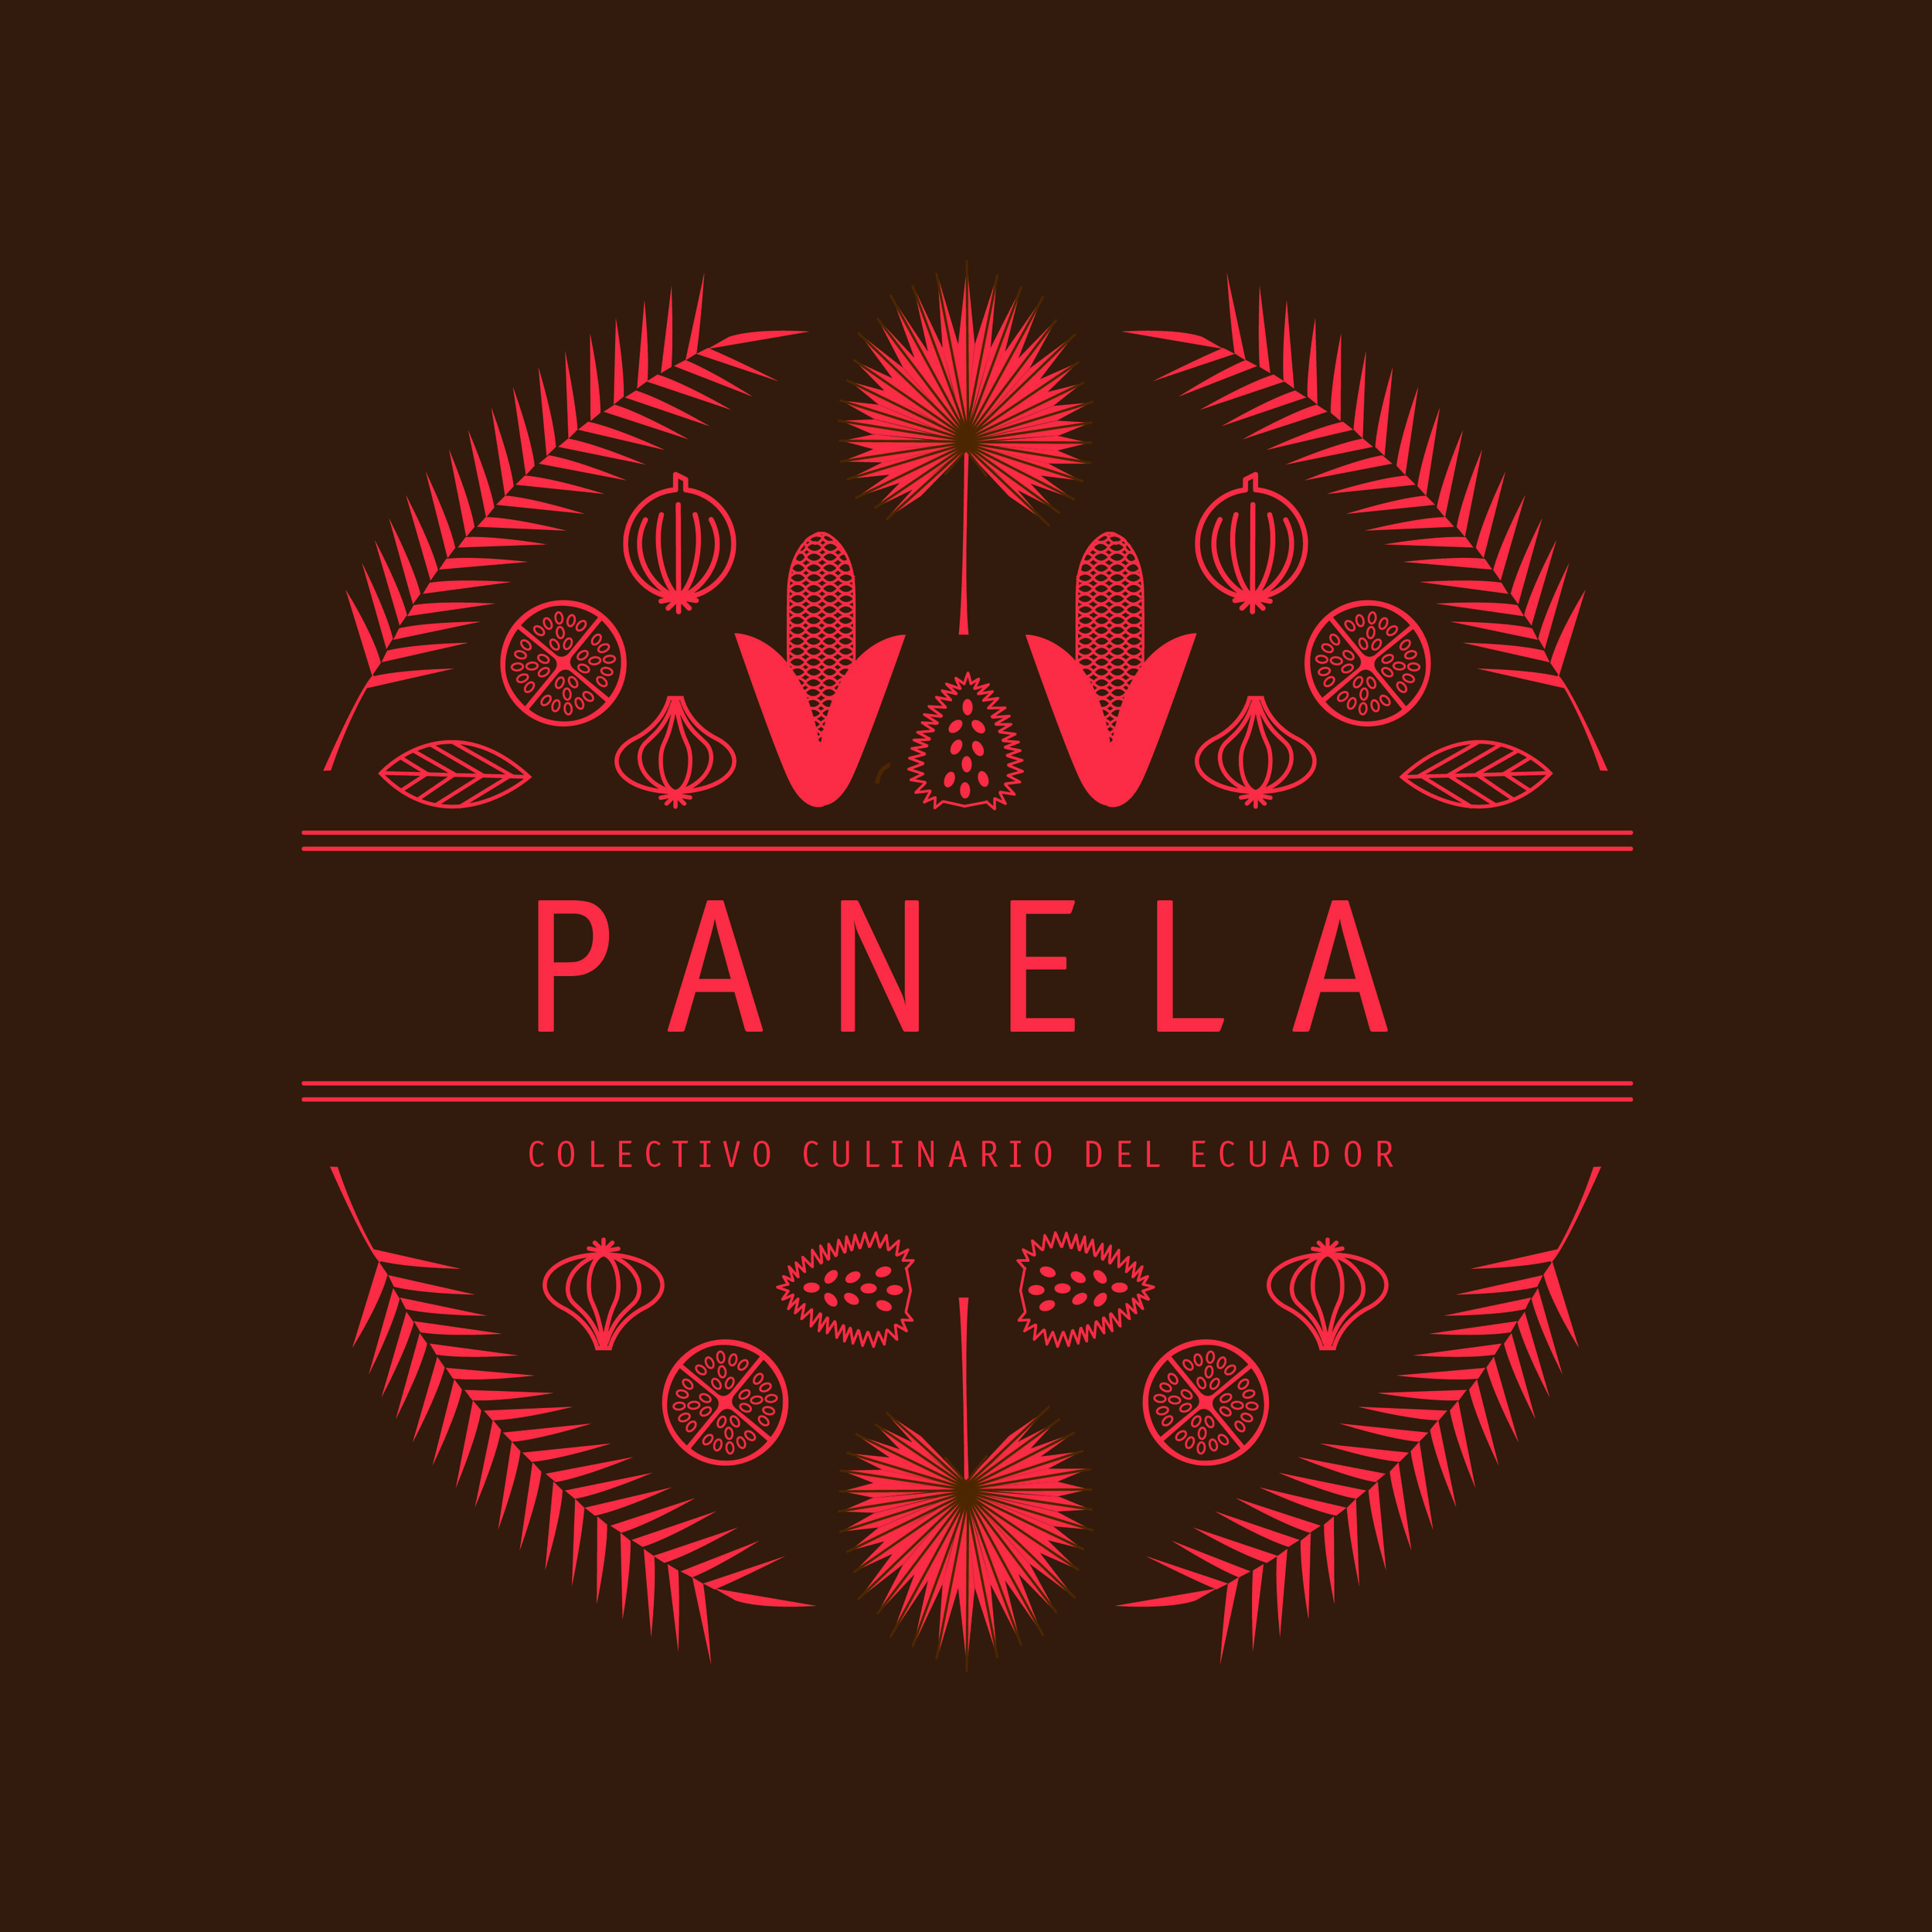 PANELA-01.jpg